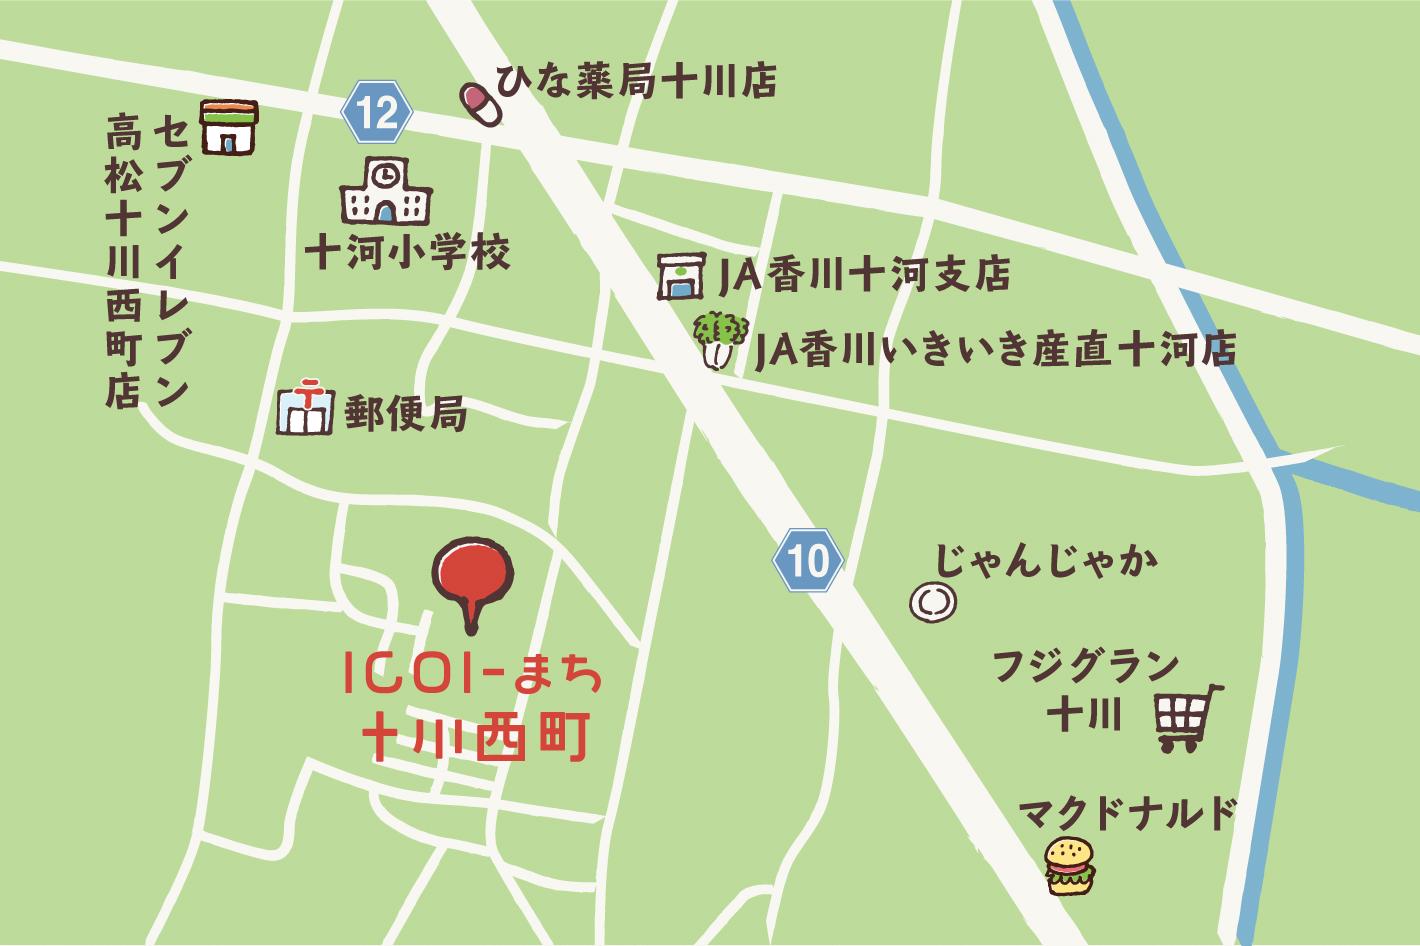 分譲地 ~高松市十川西町~ 「ICOI-まち 十川西」 地図